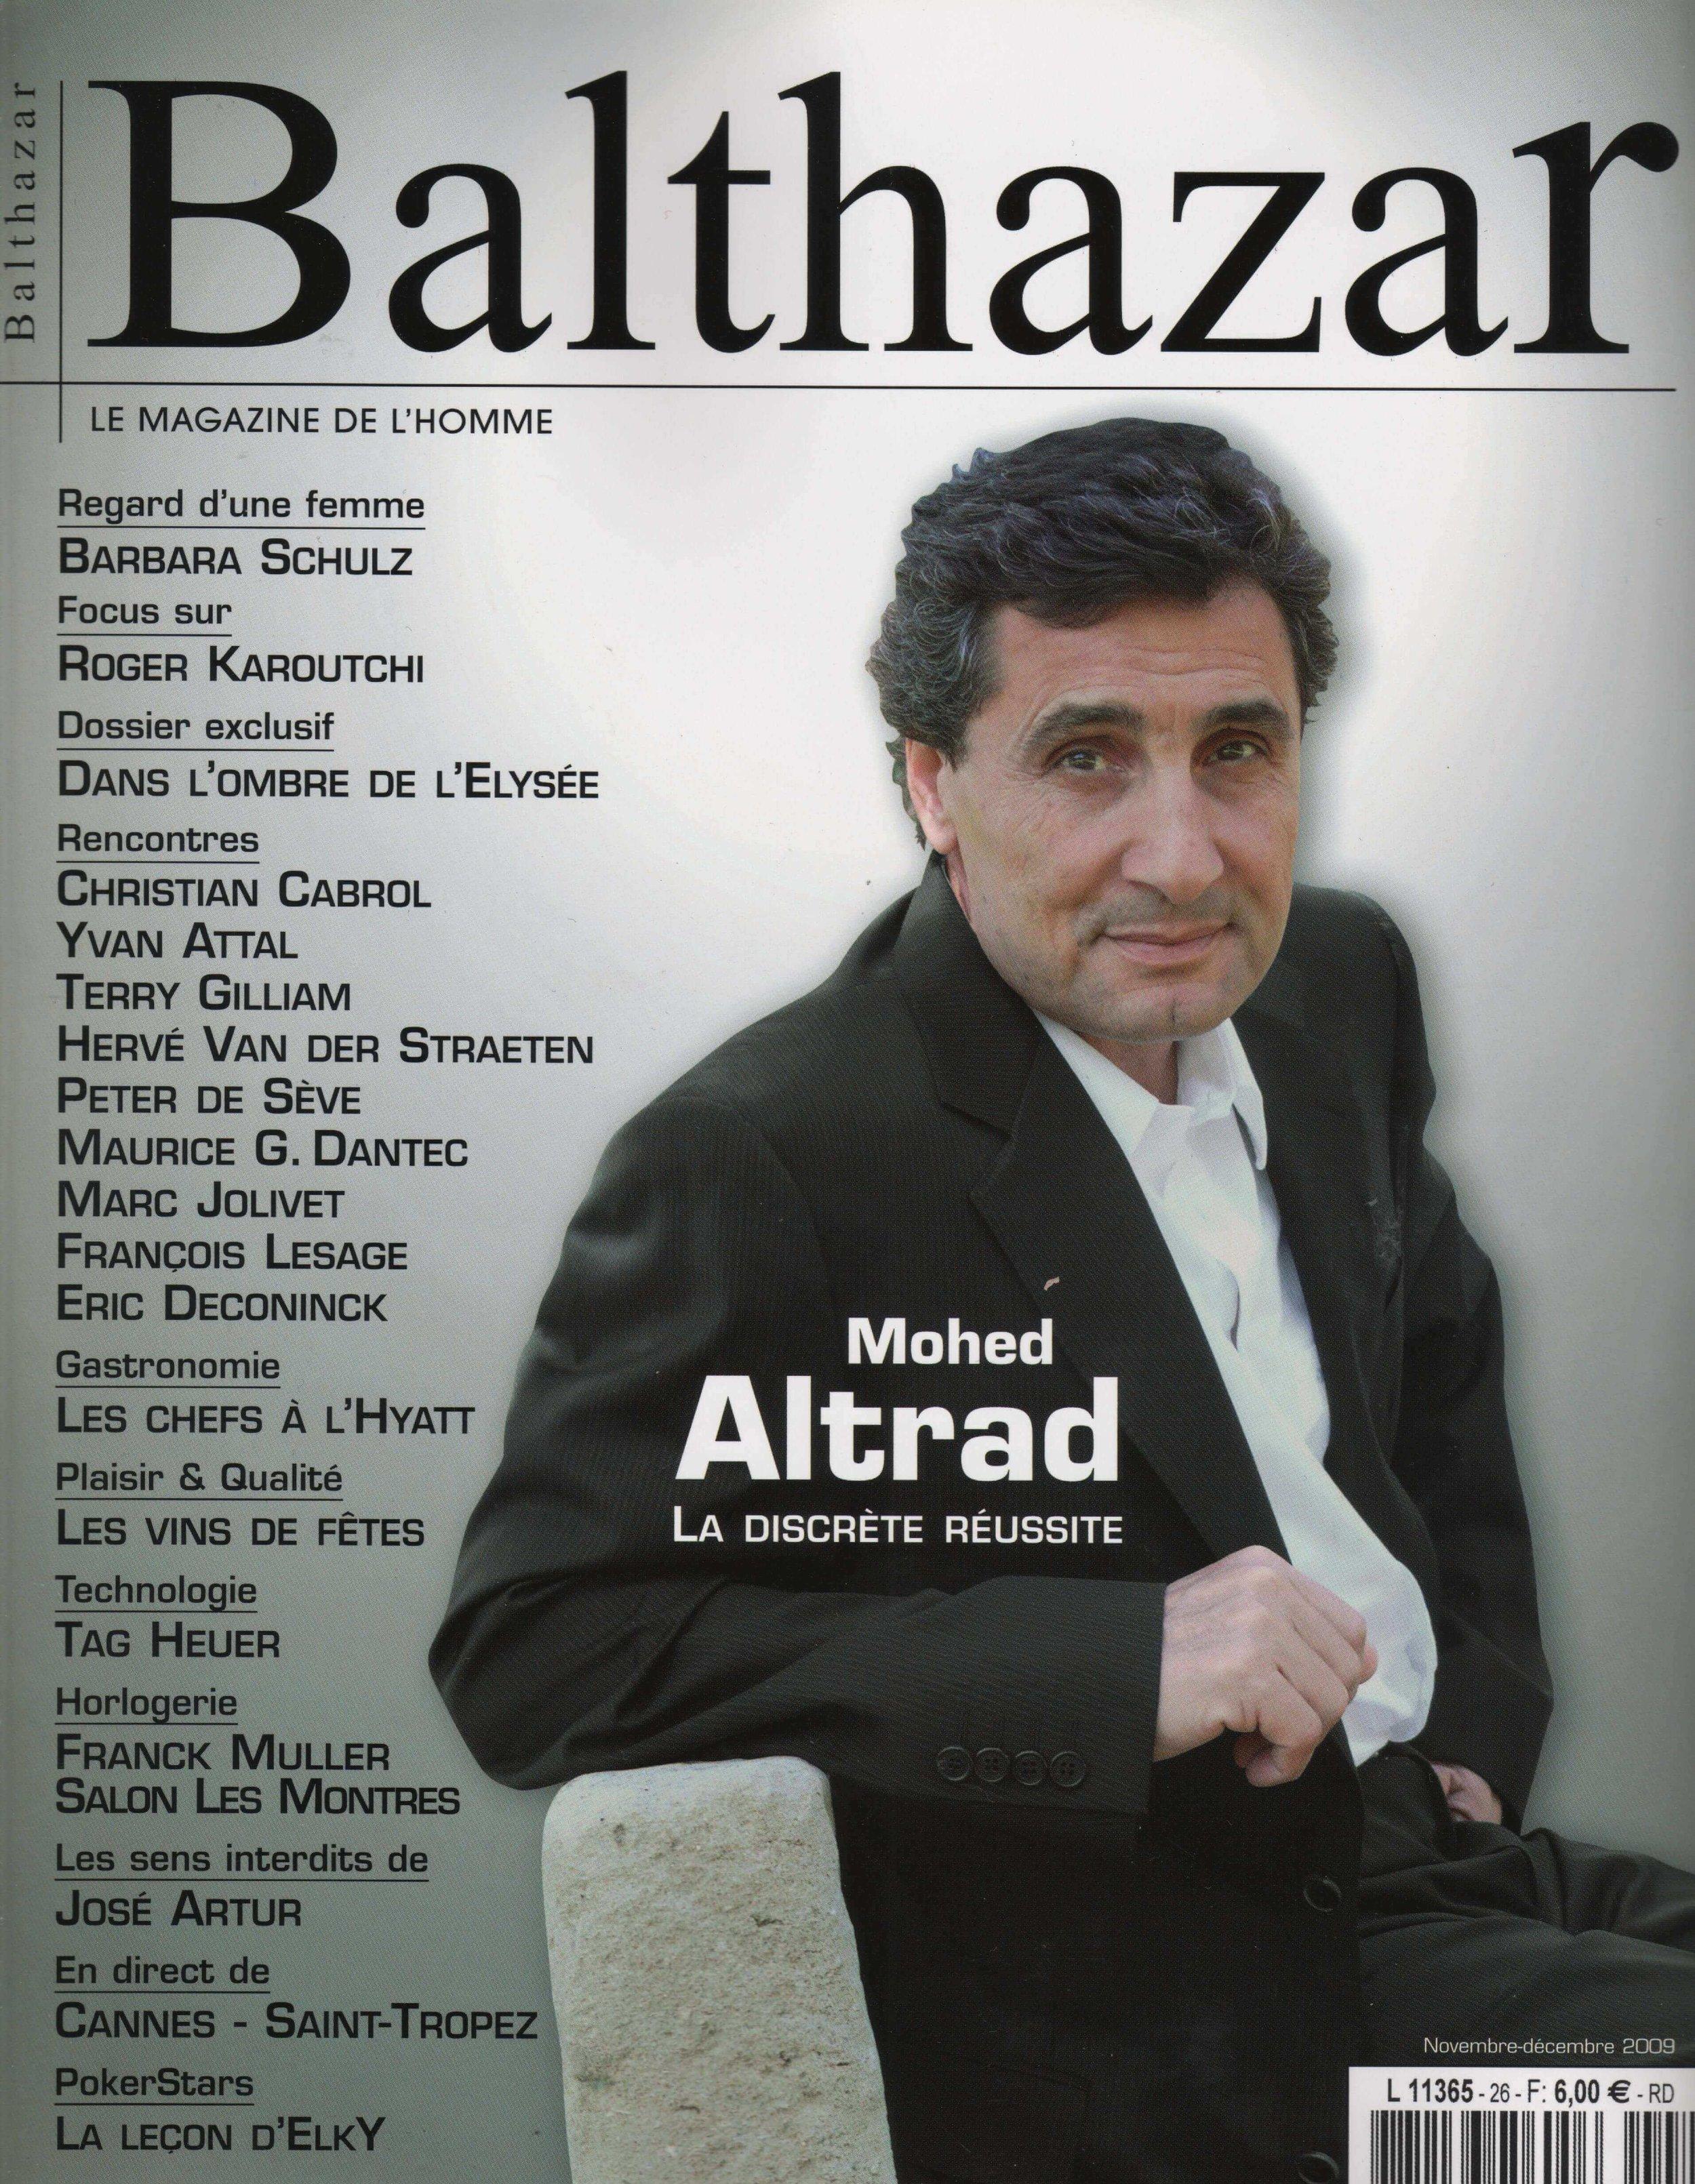 2009 Balthazar - Décembre 2009 - Couve 001.jpg